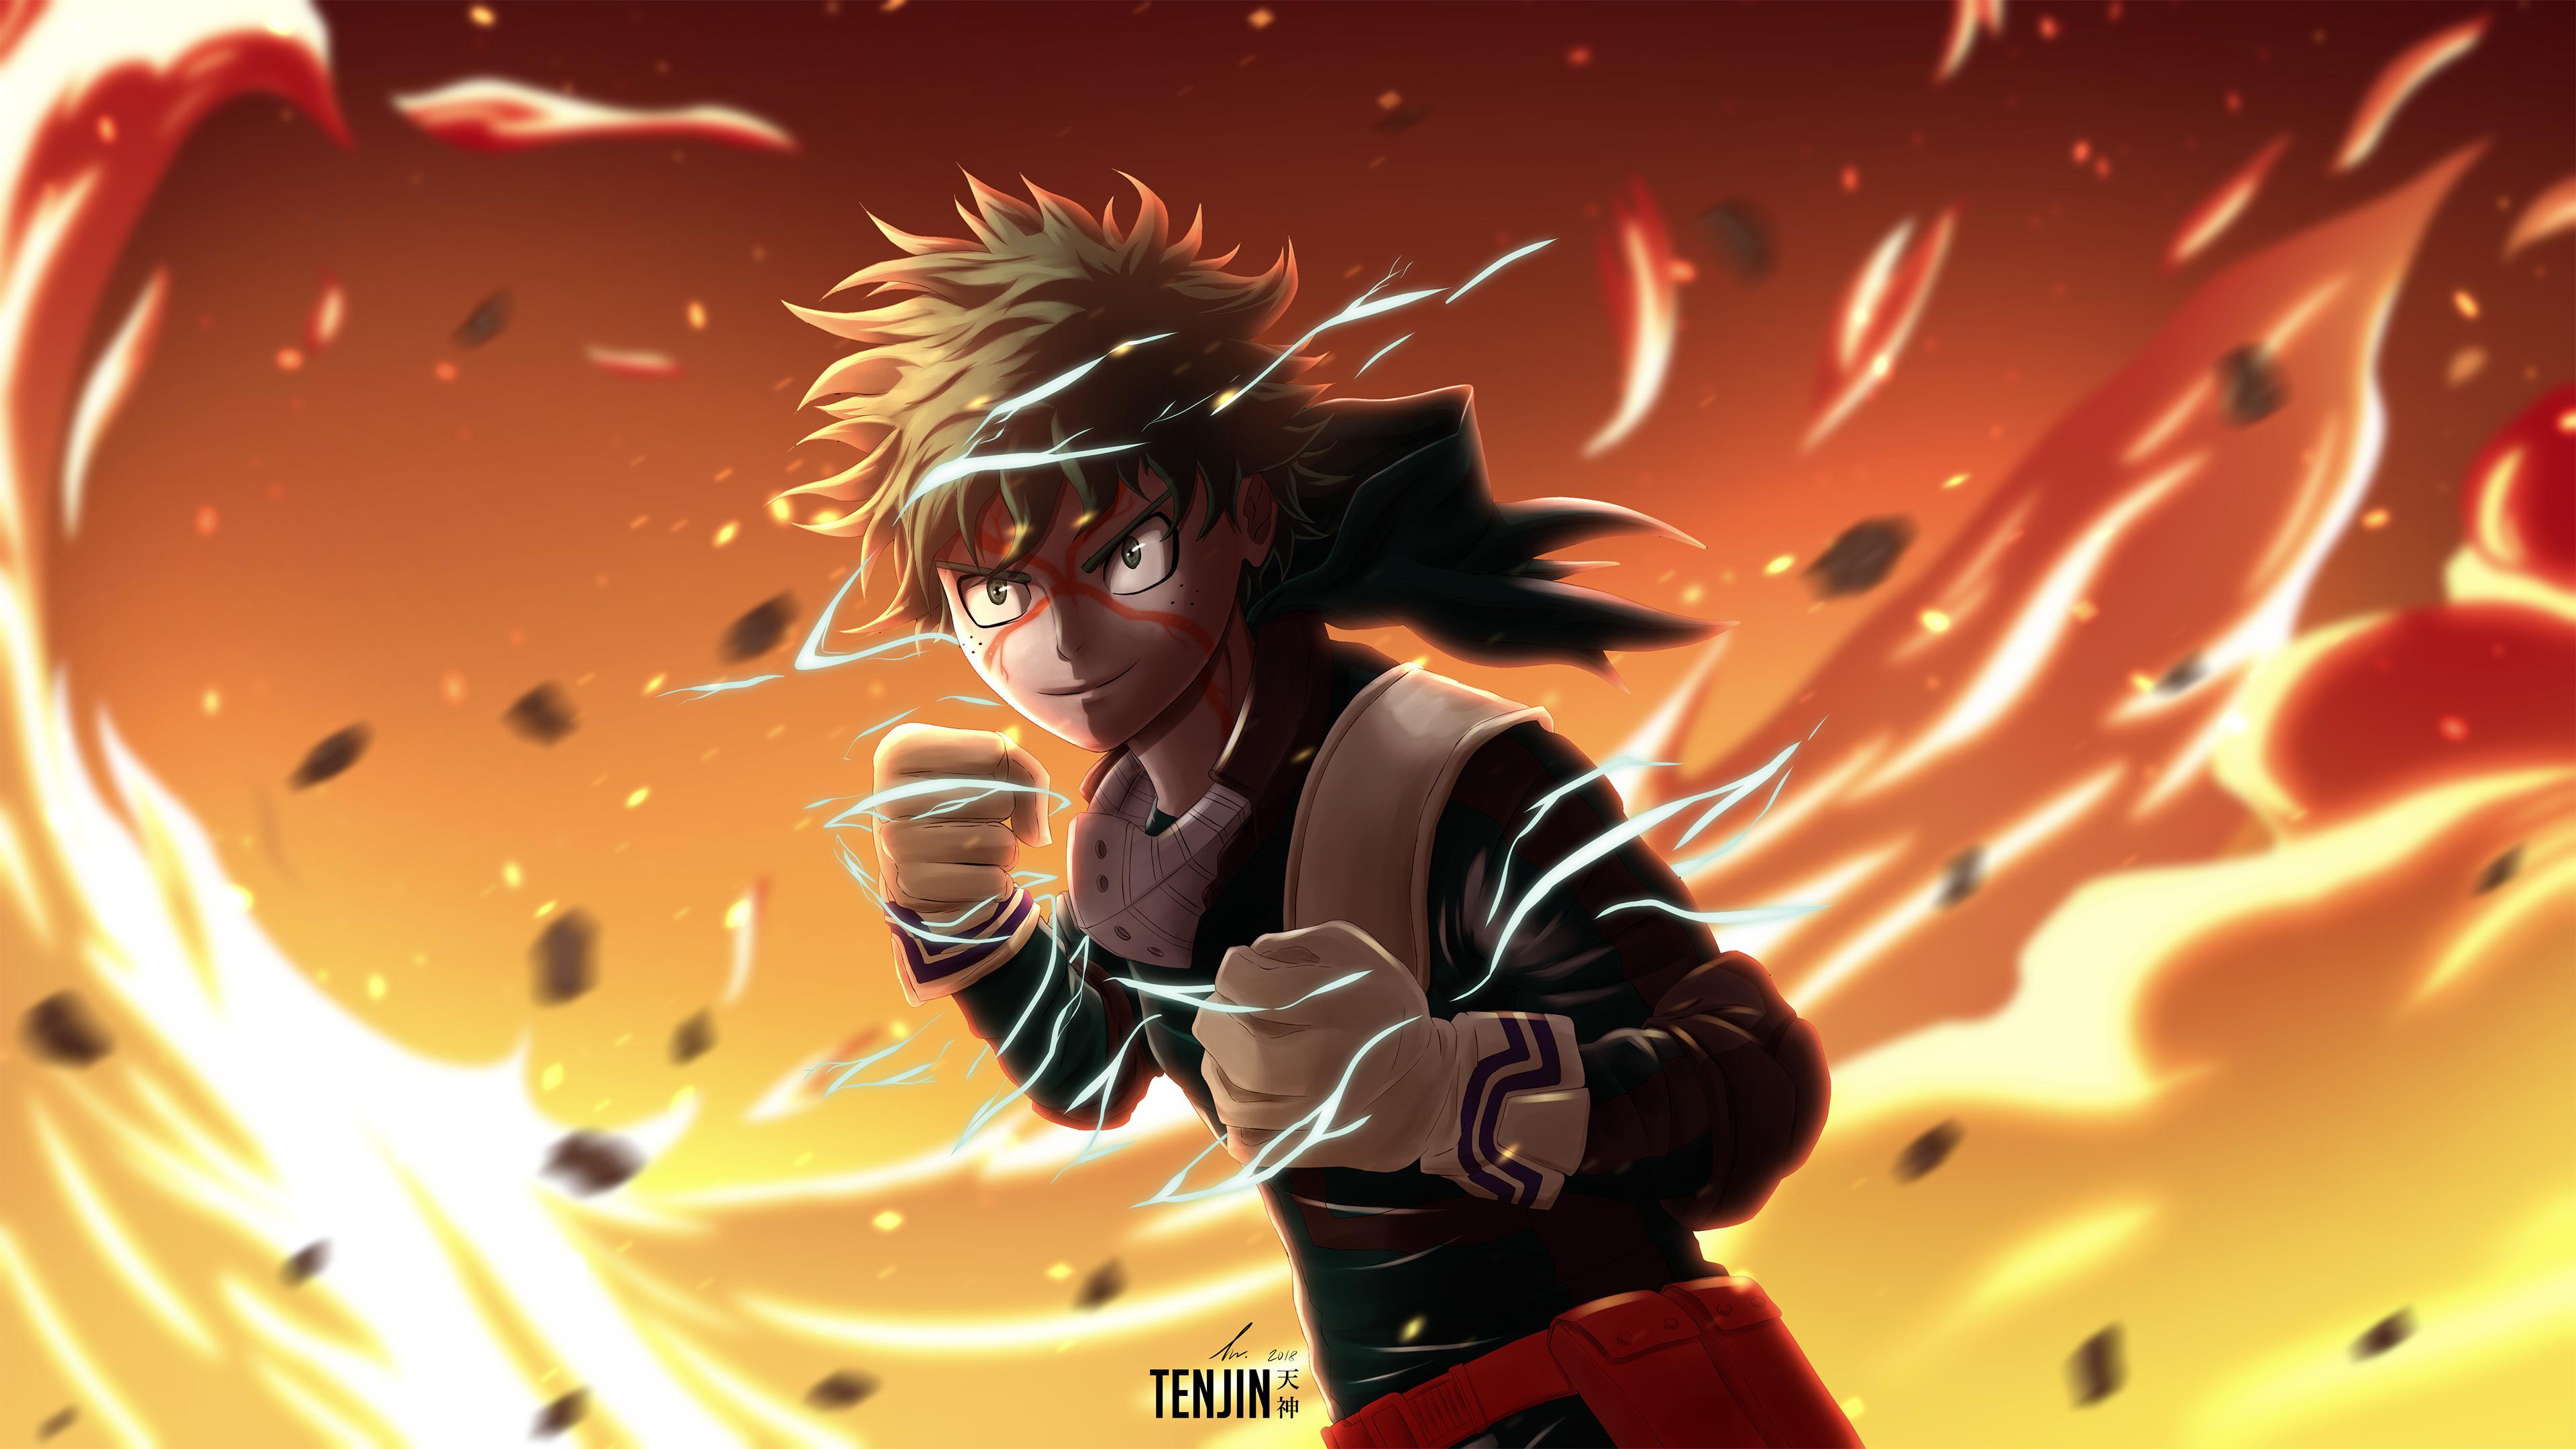 Boku No Hero Academia Wallpaper Cute My Hero Academia Izuku Midoriya 4k Hd Anime 4k